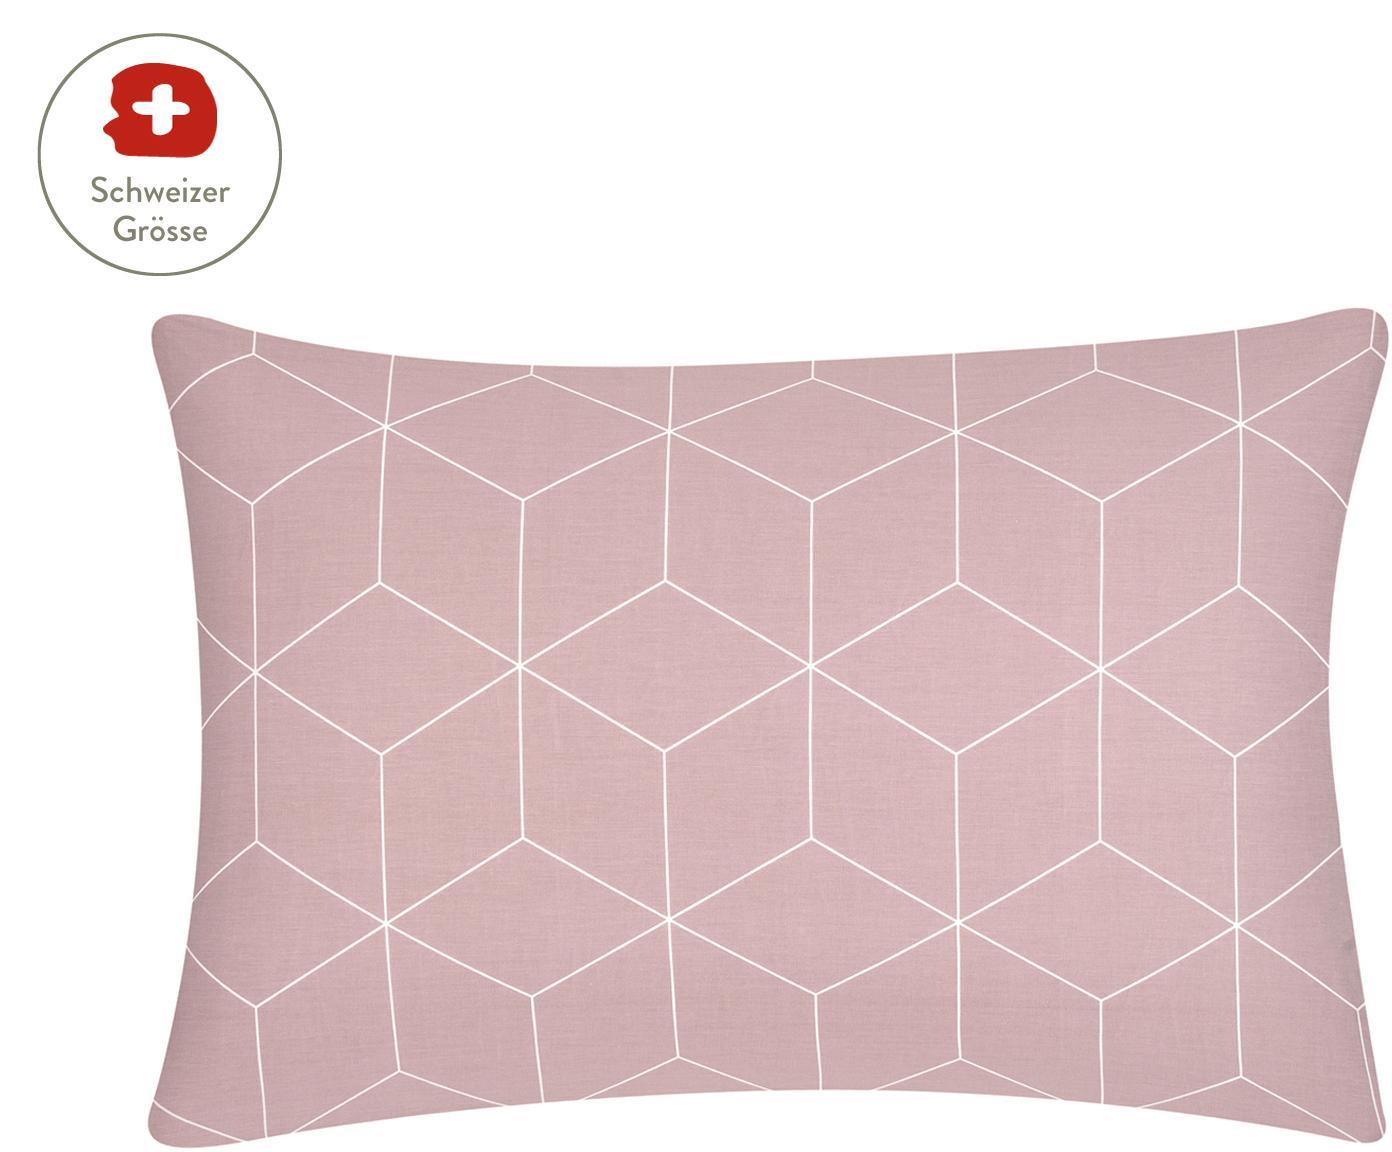 Baumwoll-Kissenbezug Lynn mit grafischem Muster, Webart: Renforcé Fadendichte 144 , Altrosa, Cremeweiss, 65 x 100 cm